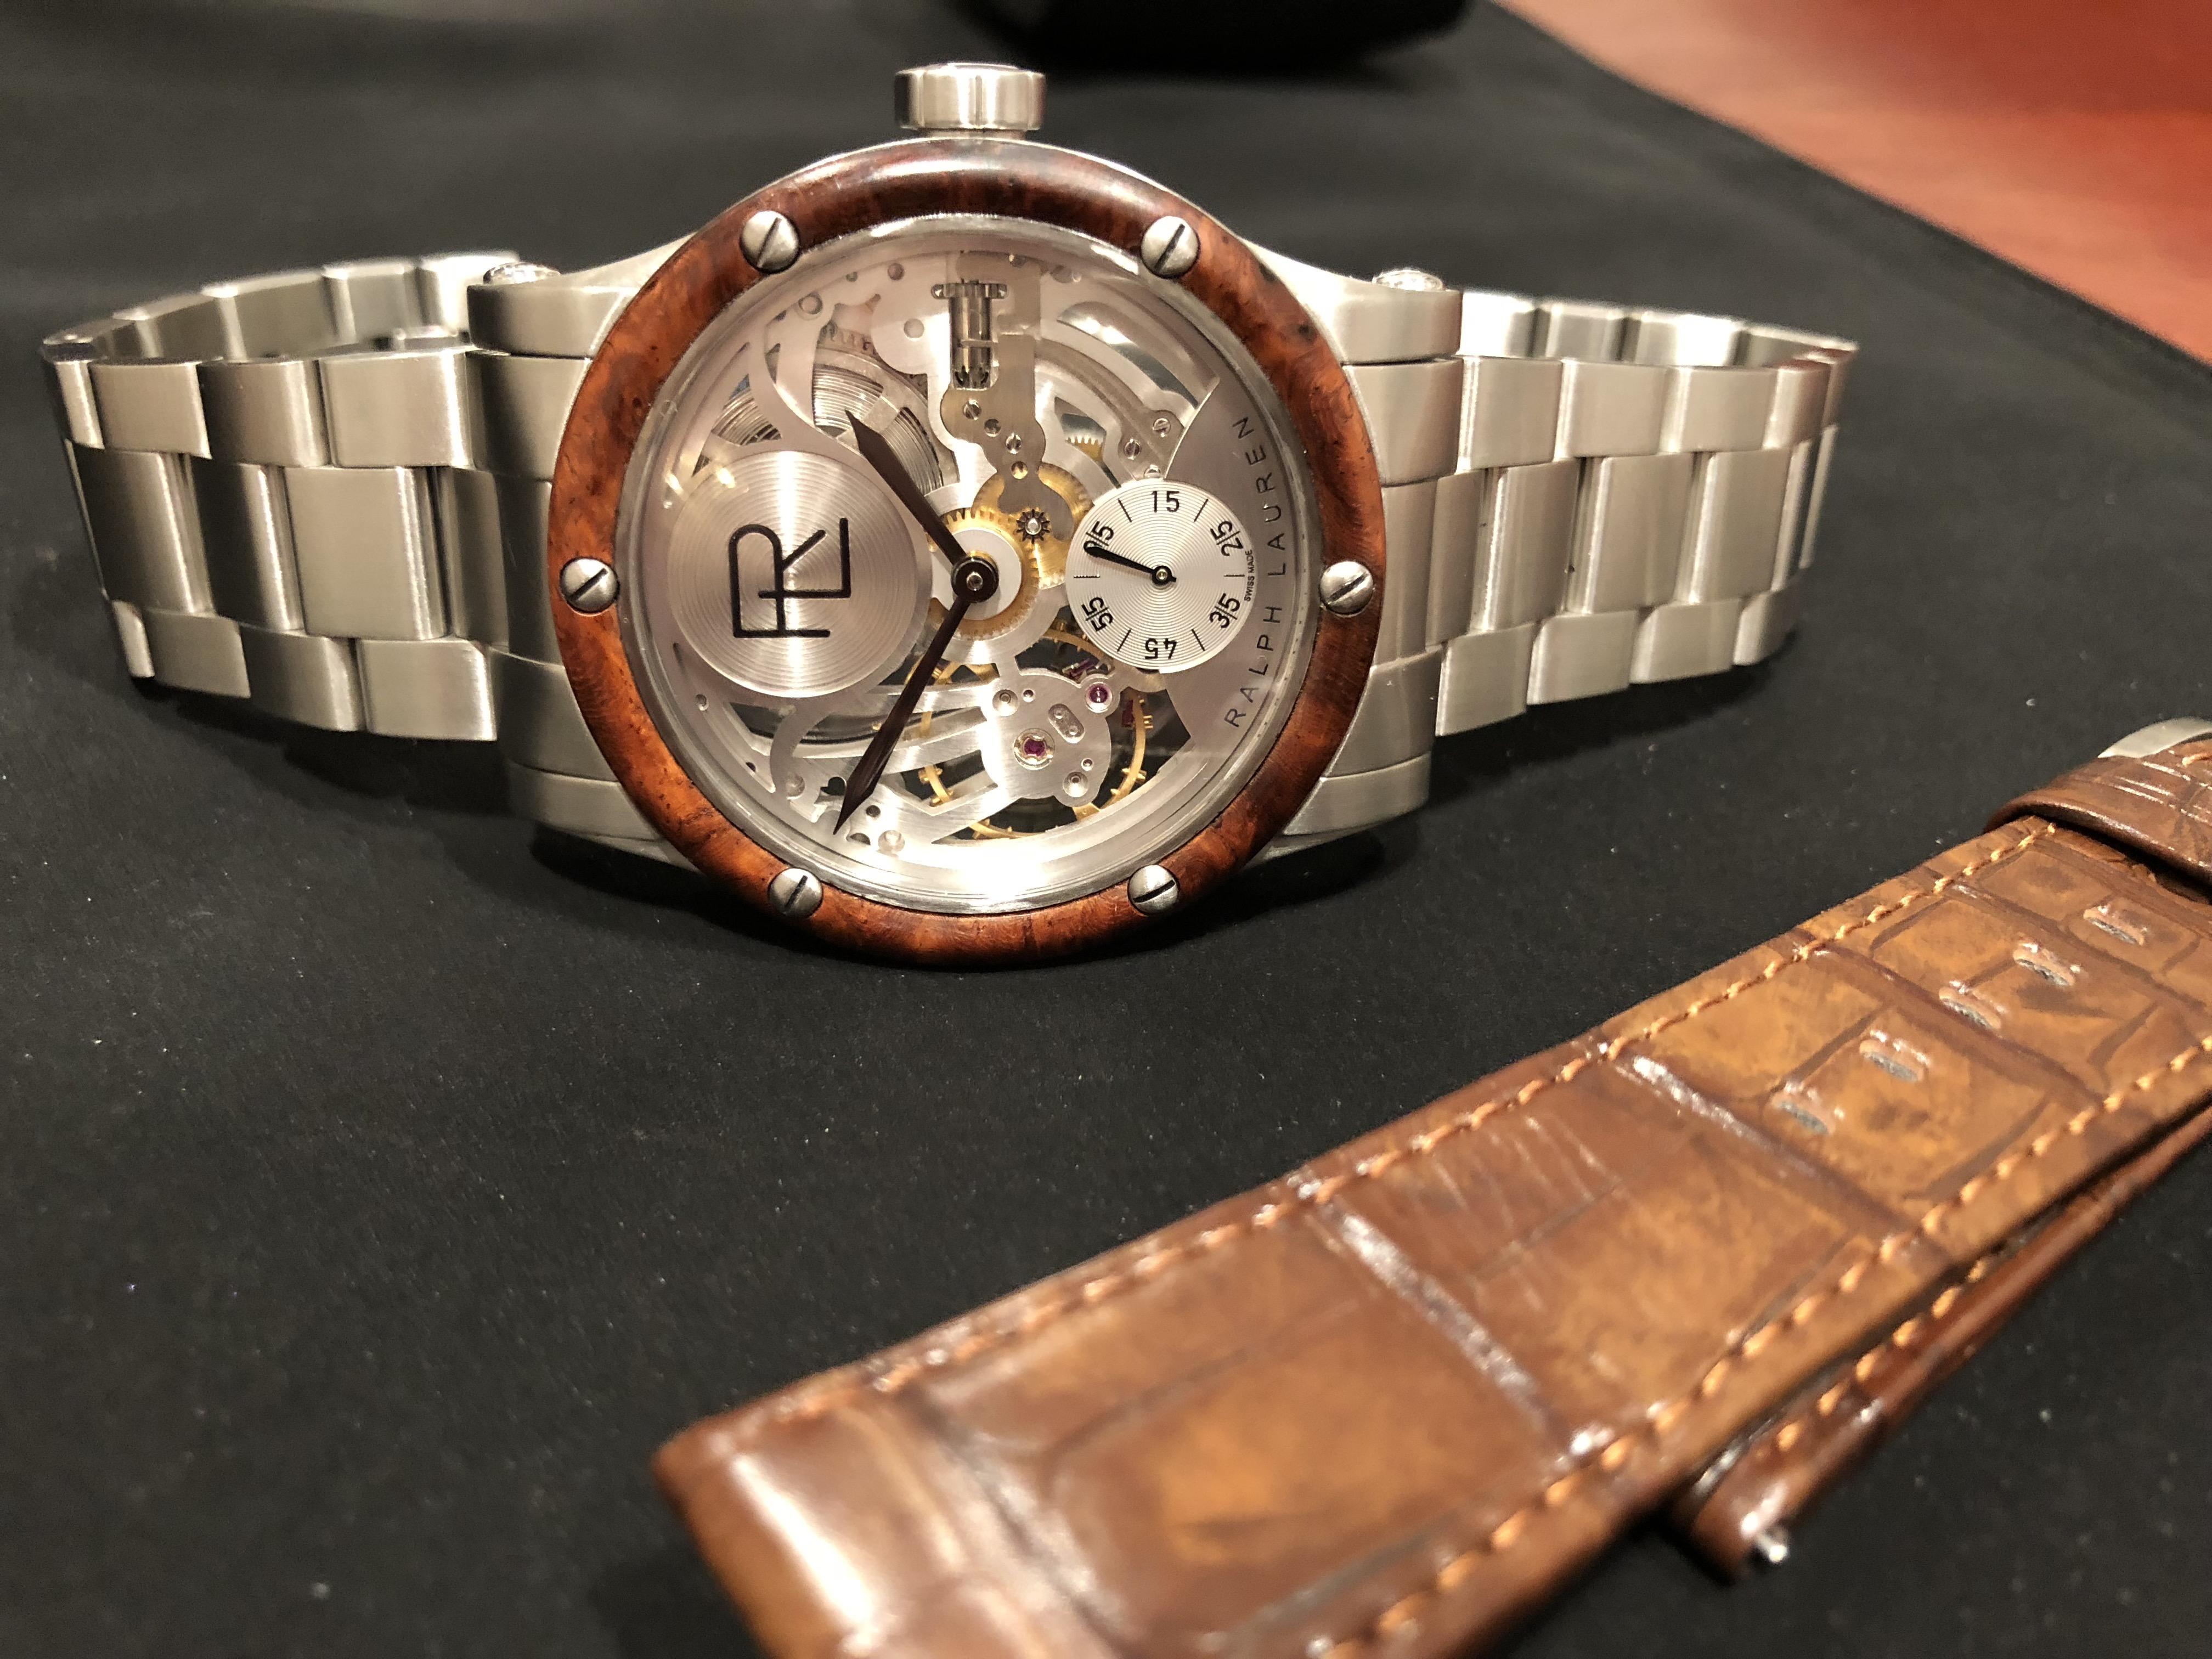 The new Ralph Lauren Automotive 45mm Skeleton Steel watch is sold with interchangeable strap/bracelet.